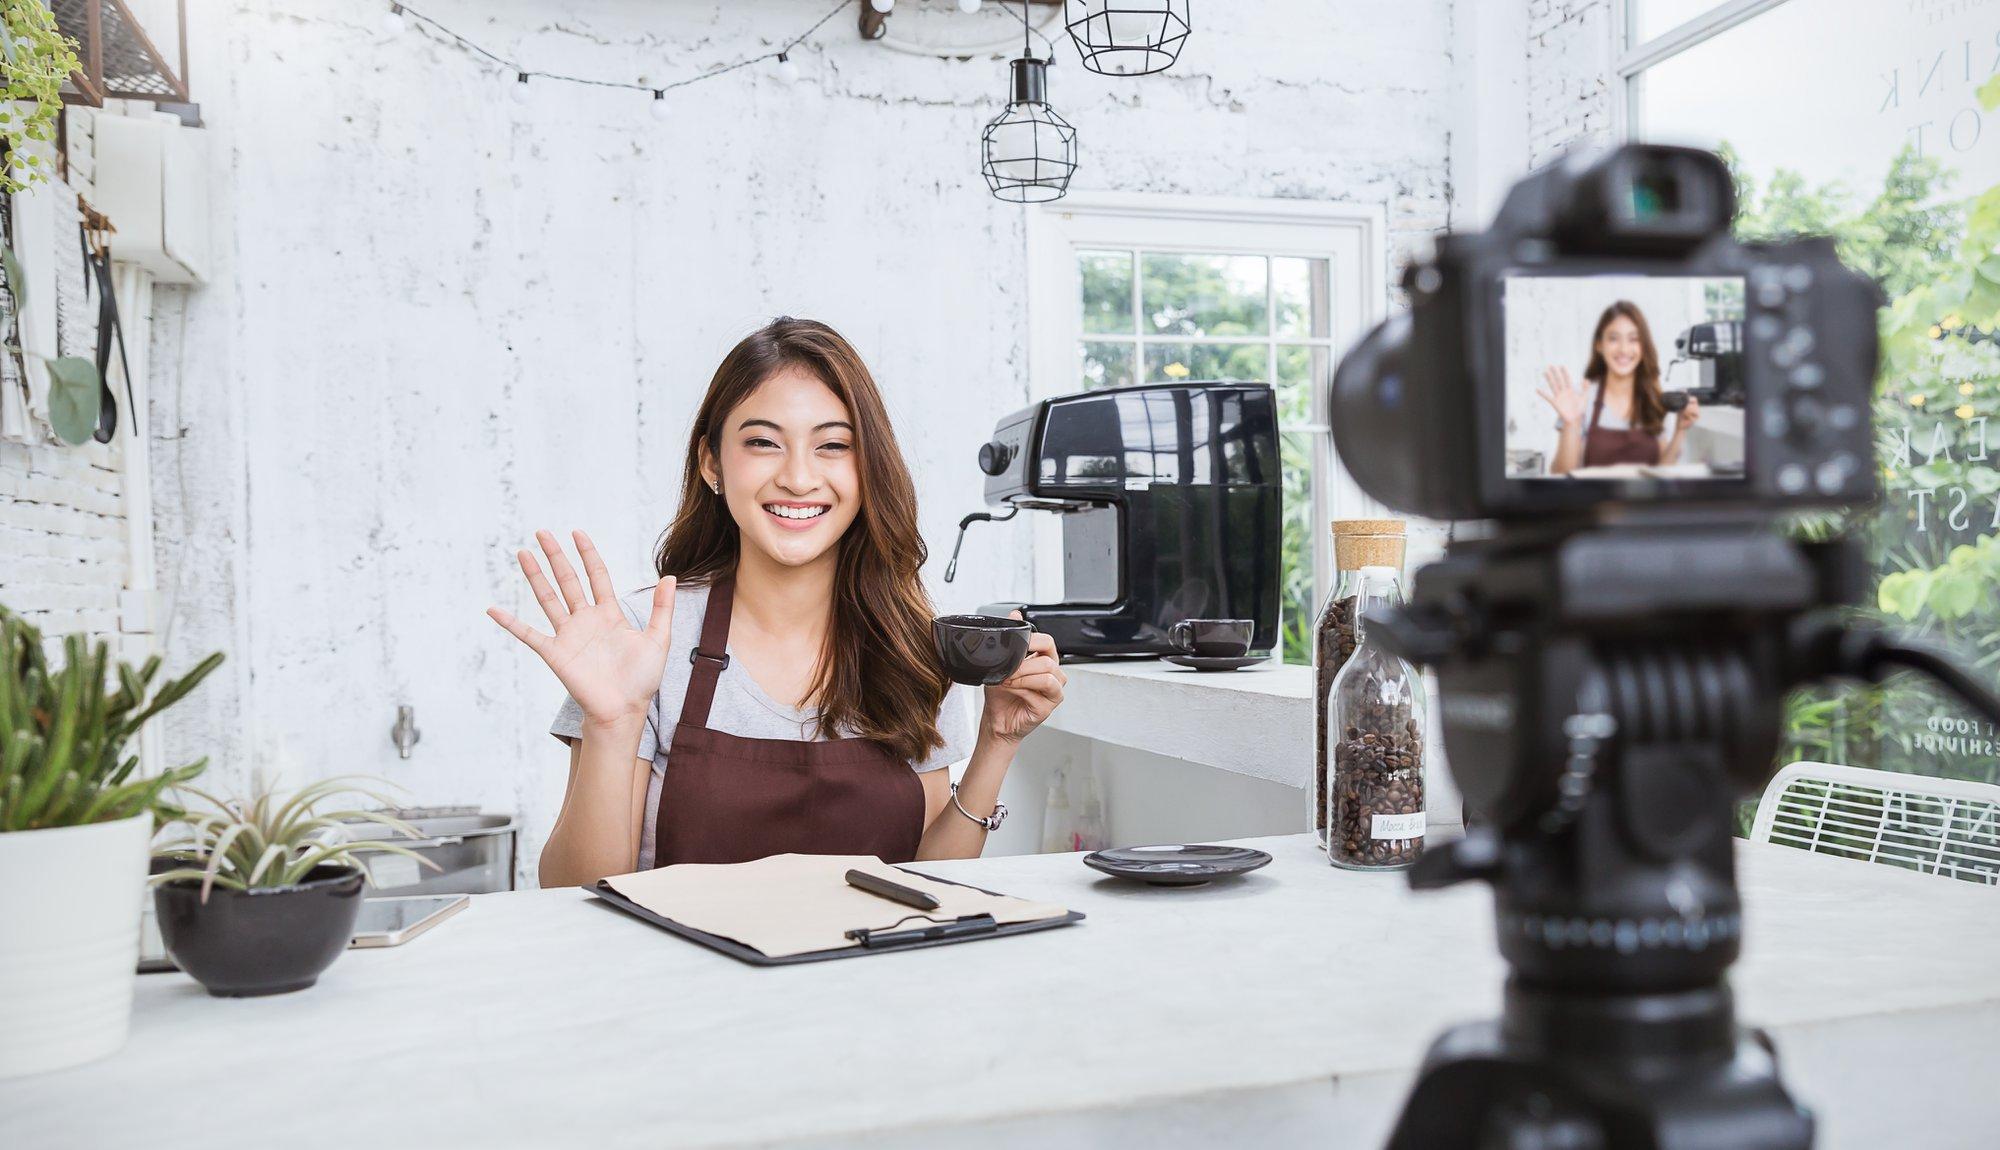 types of video marketing